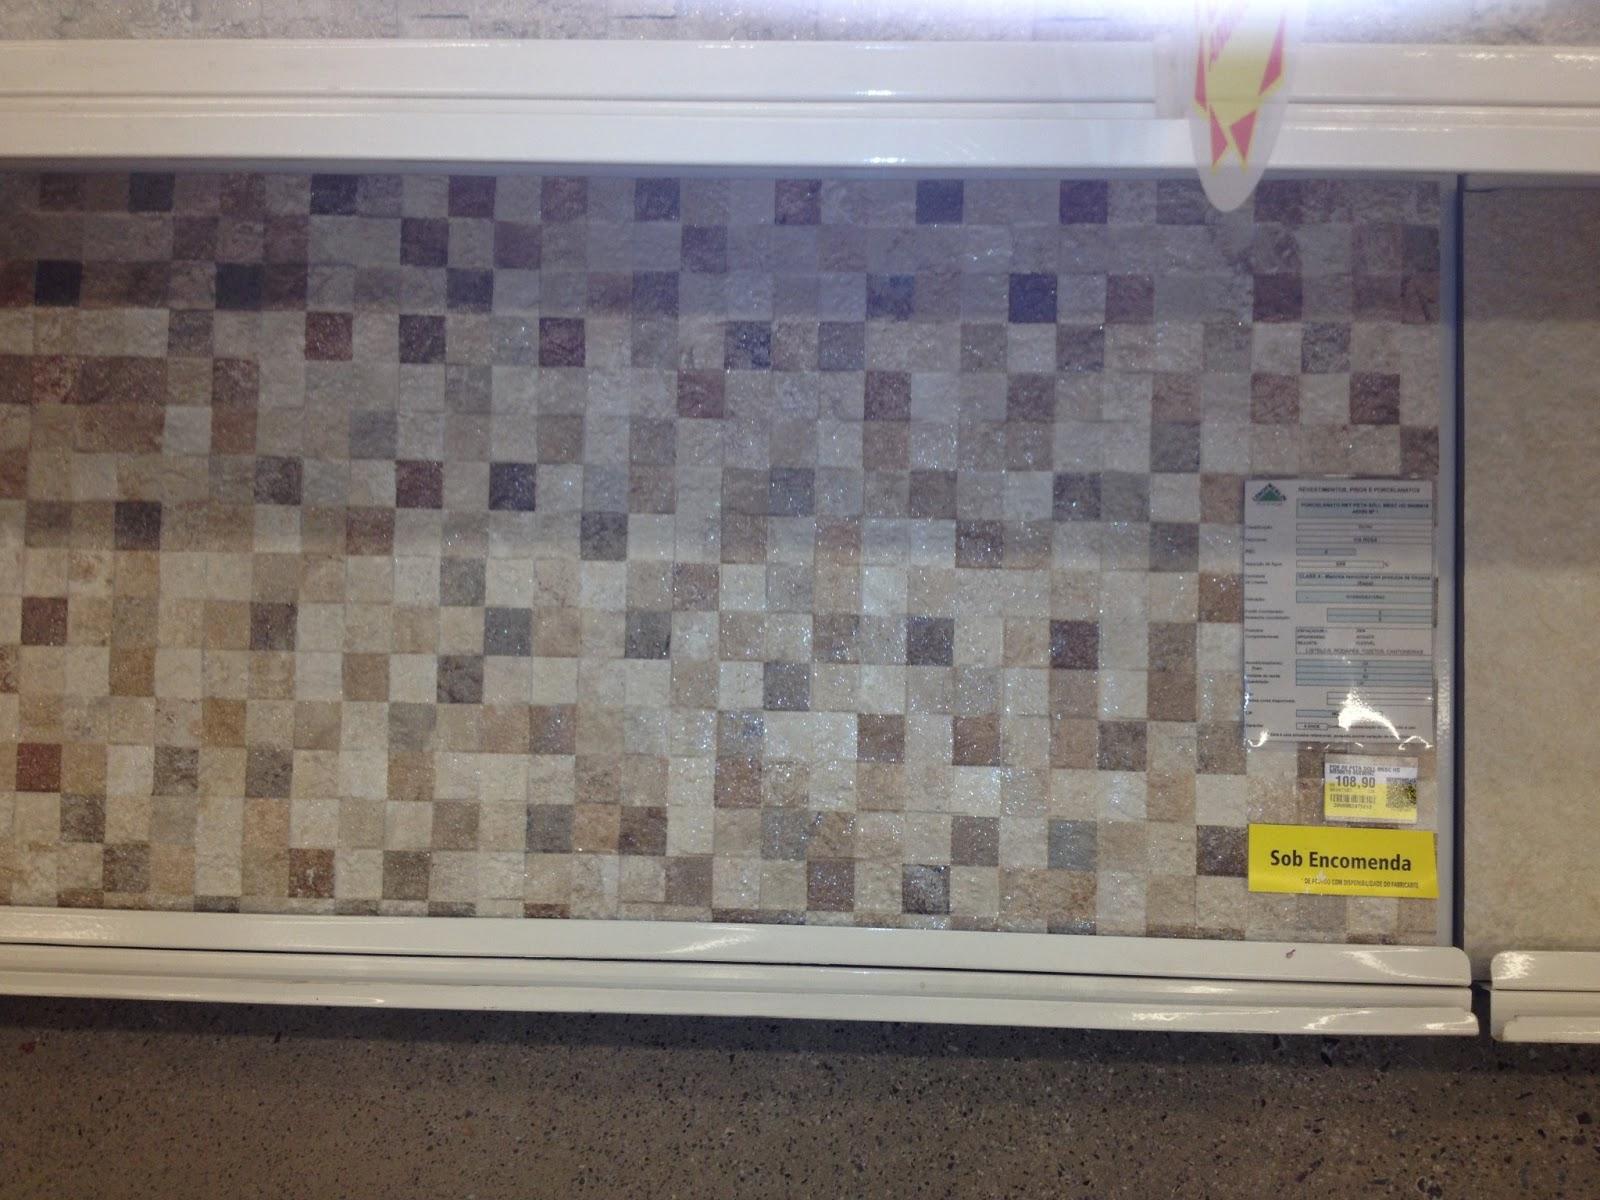 #A59726 Porcelanato imitando mosaico de pedras. Preço: R$ 108 90 690 Janelas Sasazaki Leroy Merlin